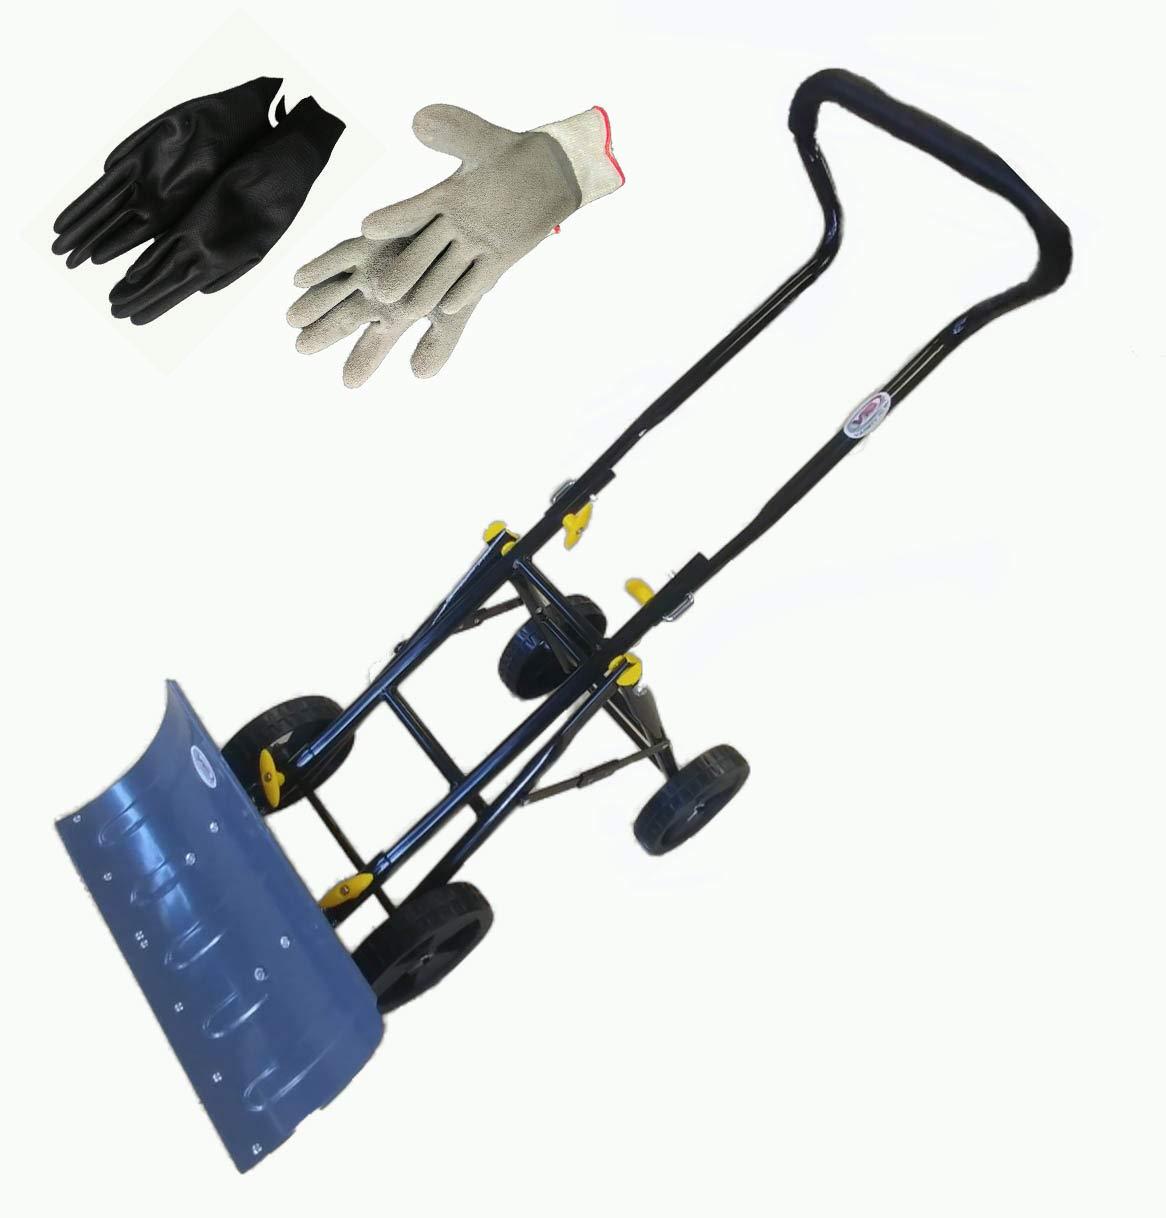 Variety To Go Pala para nieve - variedad to go Ajustable con ruedas - Pala para nieve, Heavy Duty Rolling Plow palas de nieve con 6